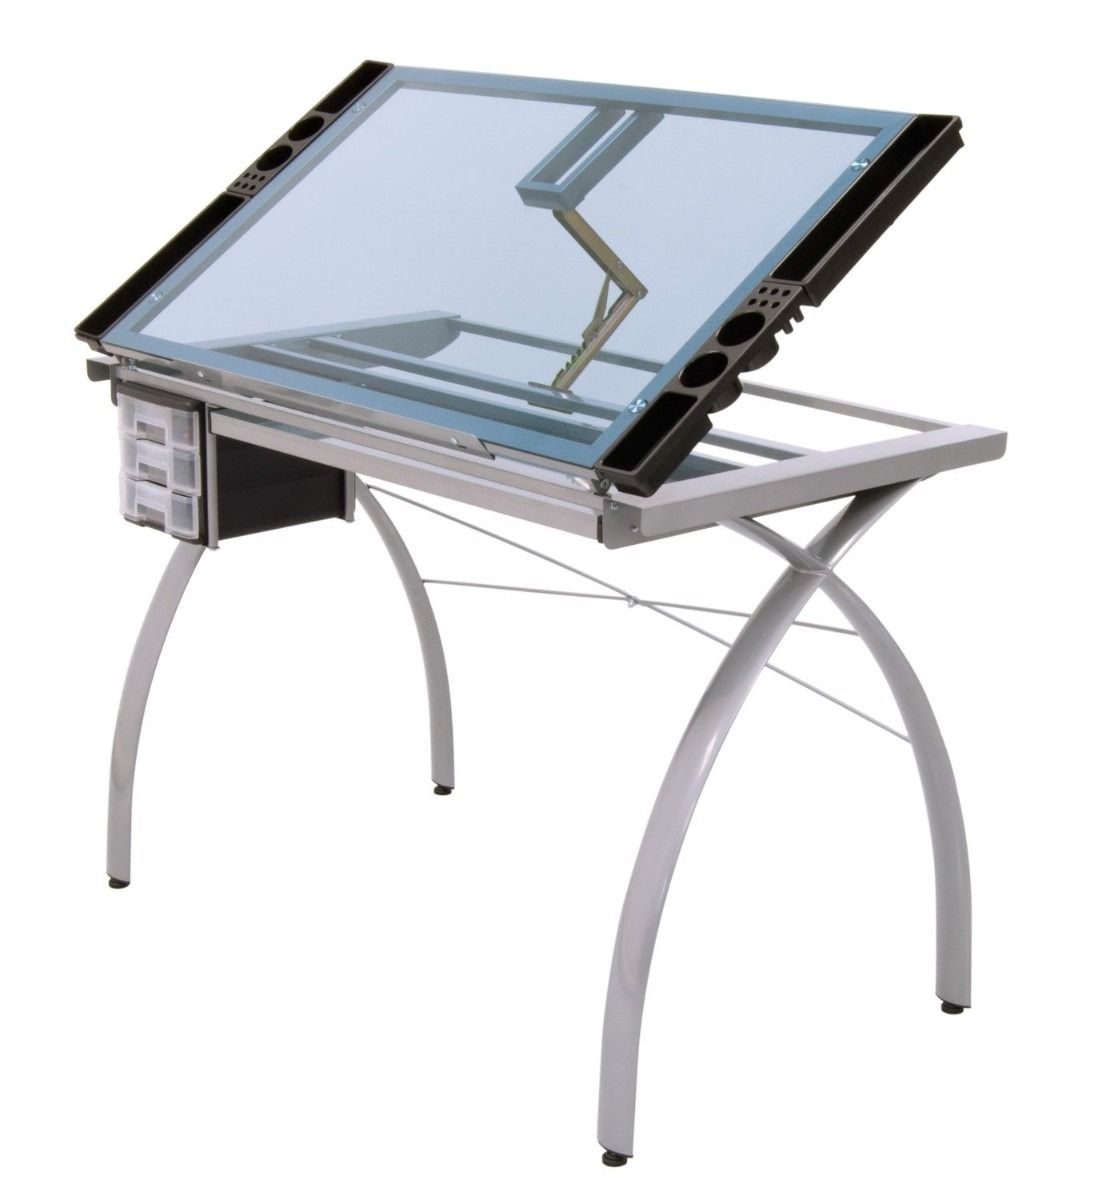 Mesa Para Dibujo Artistico De Cristal Escritorio Dibujar Vbf 13 460 06 Mesa De Dibujo Mesa De Diseno Mesas De Arquitectura